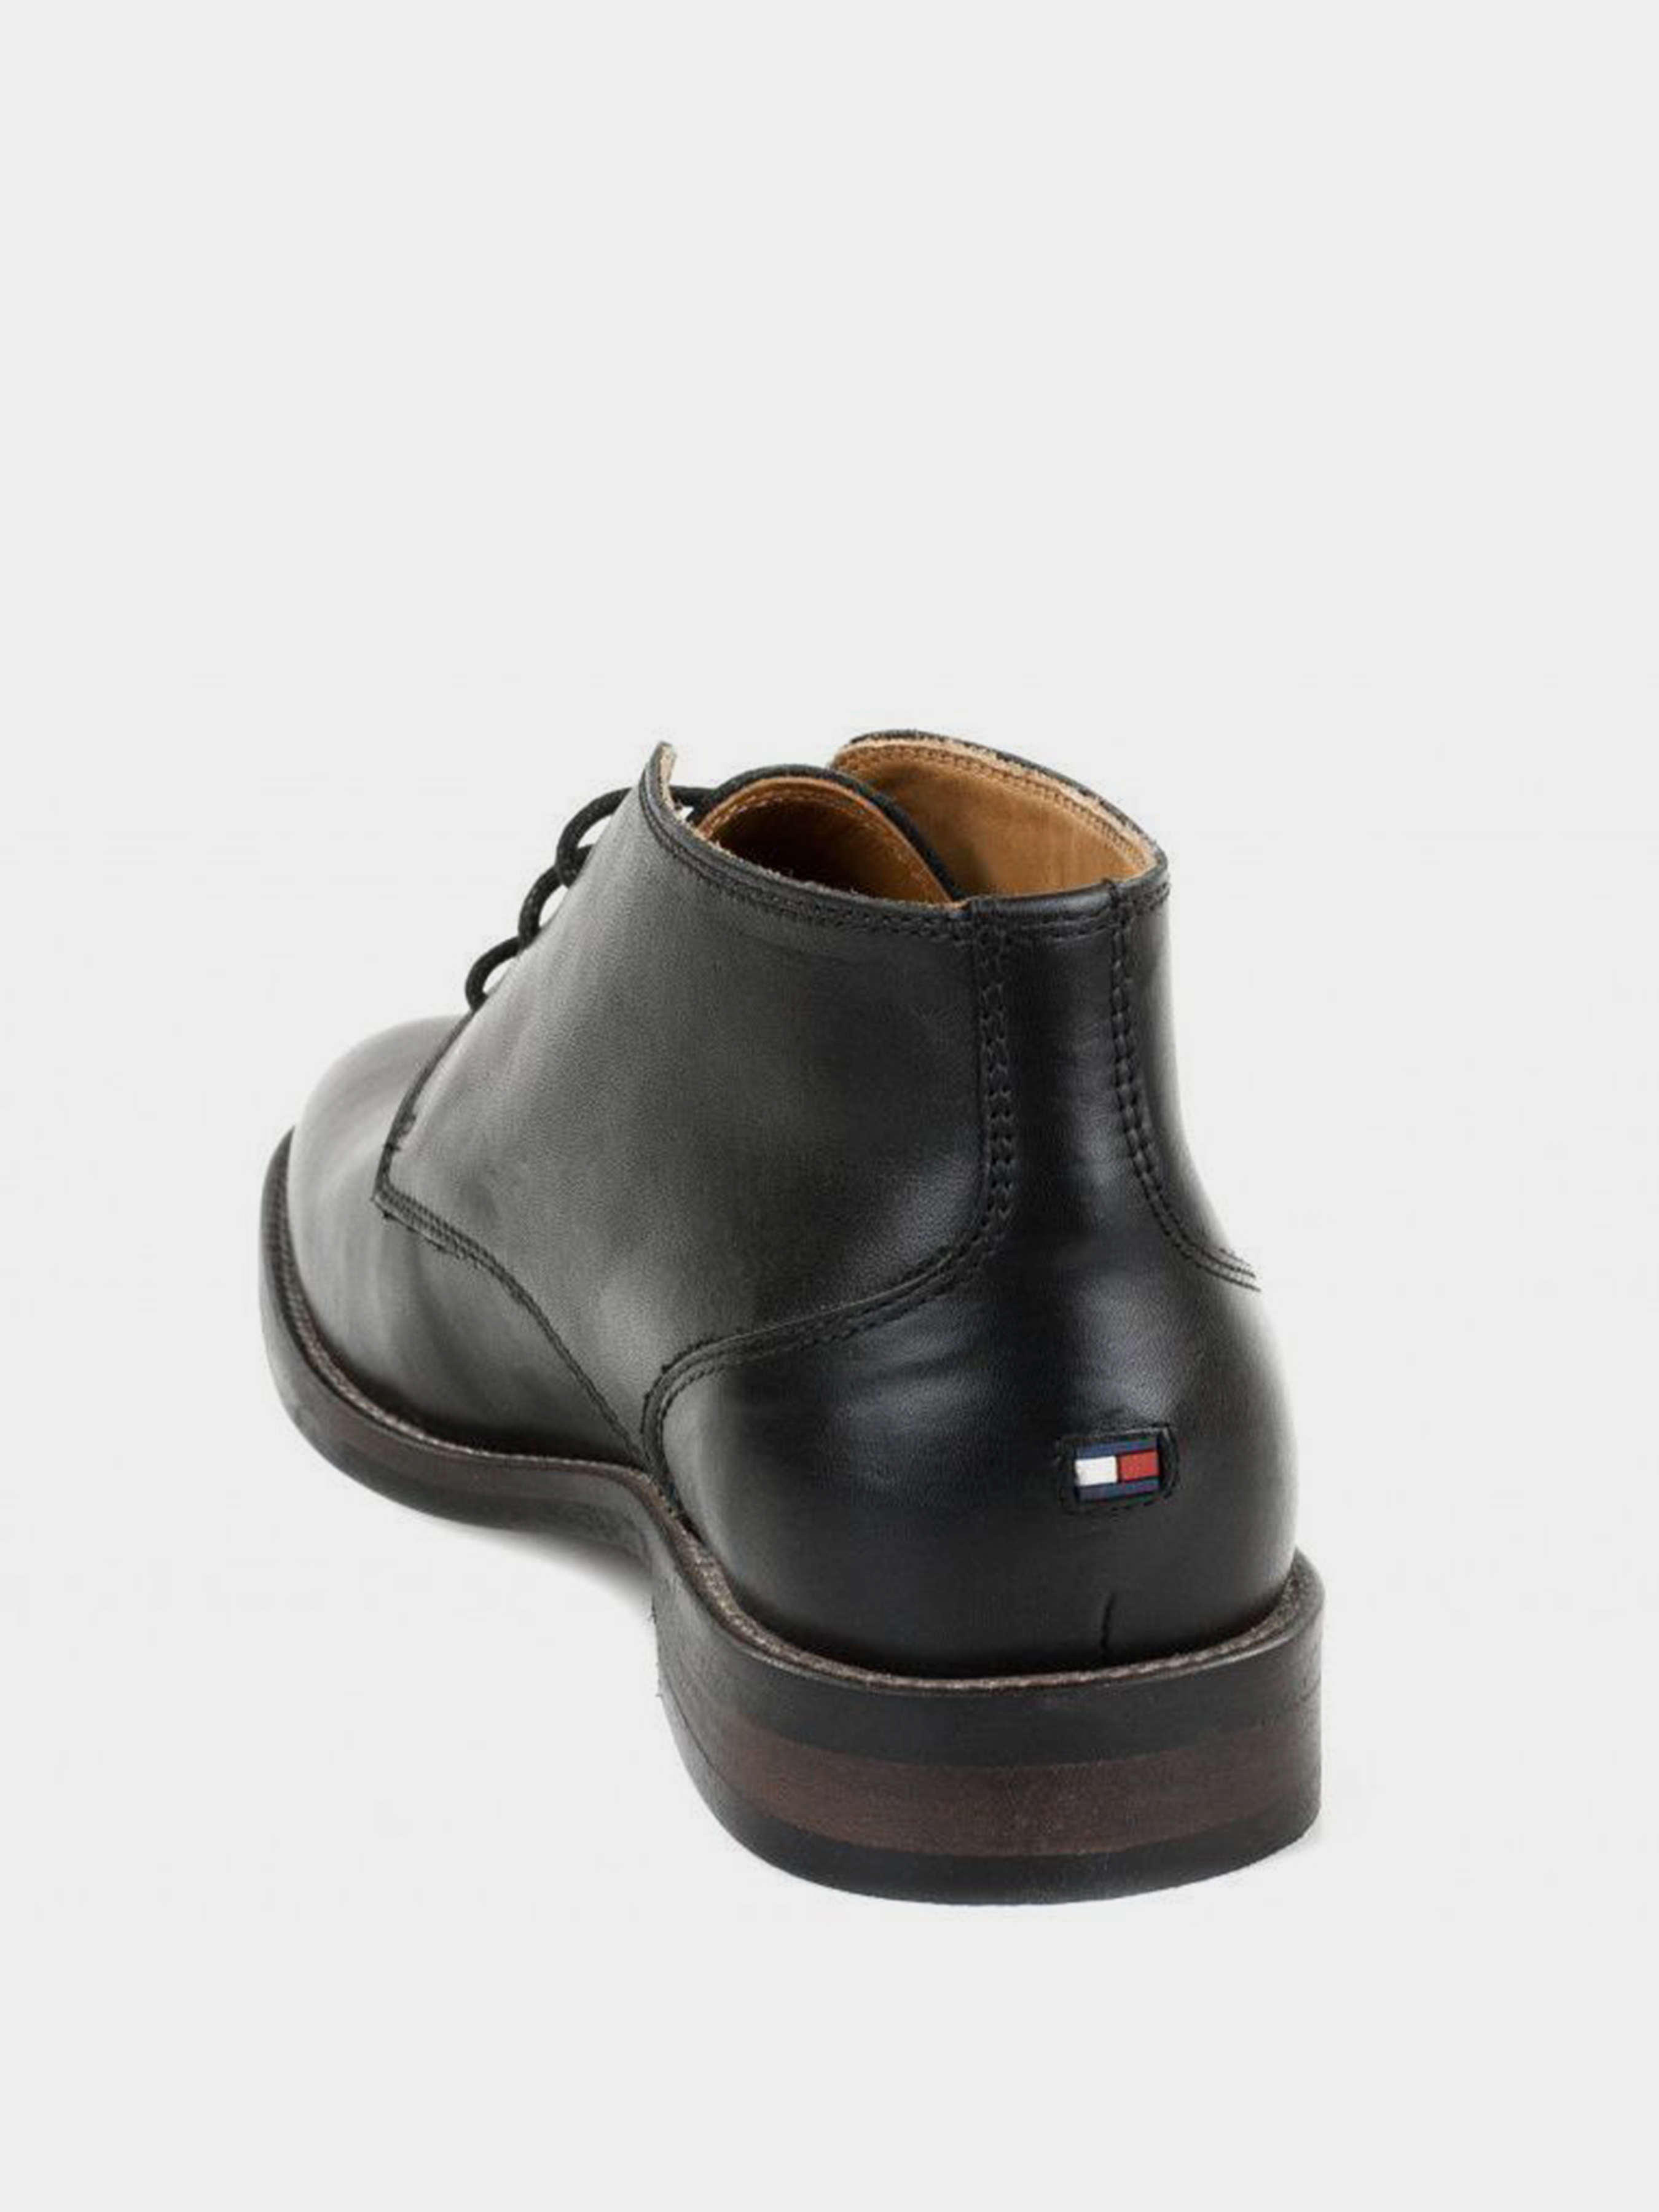 Ботинки мужские Tommy Hilfiger SPORT TE702 Заказать, 2017